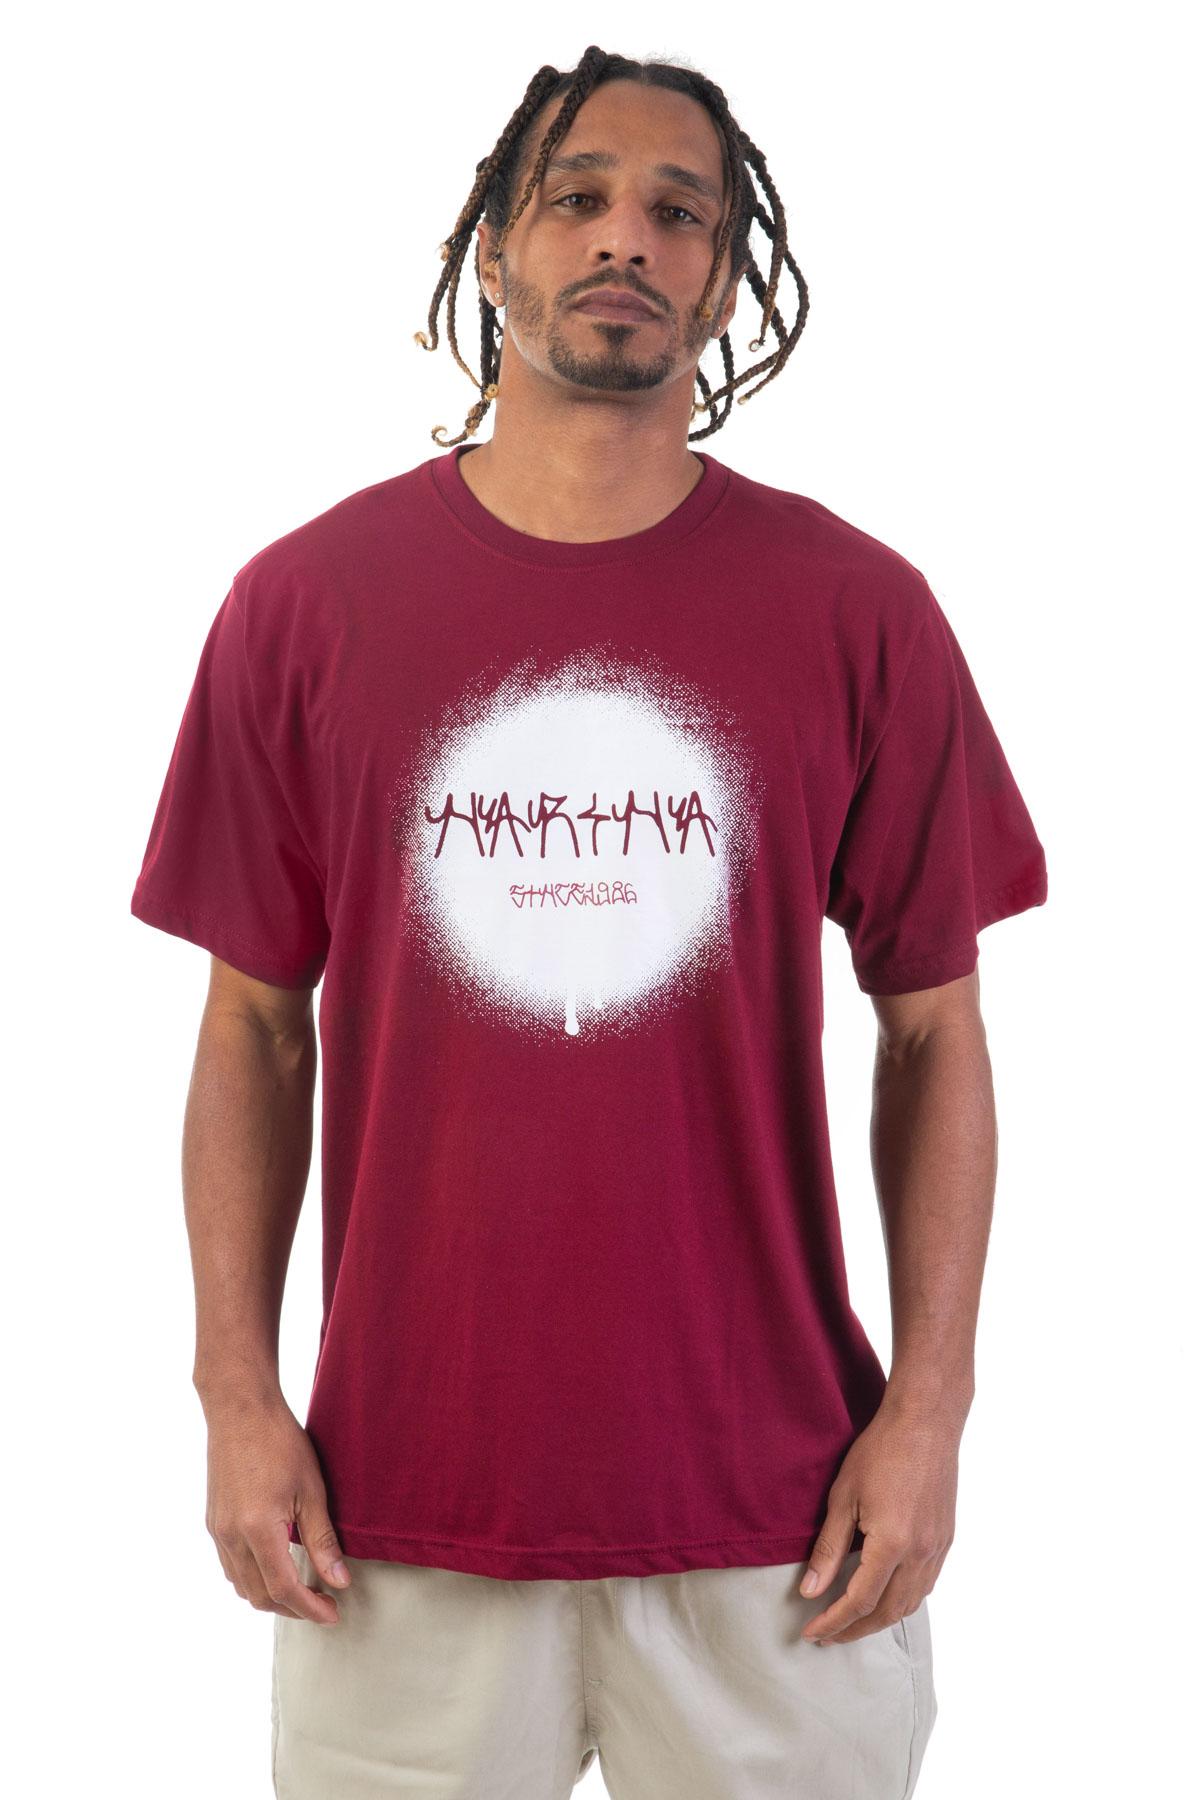 Camiseta Big Spray Narina Skate